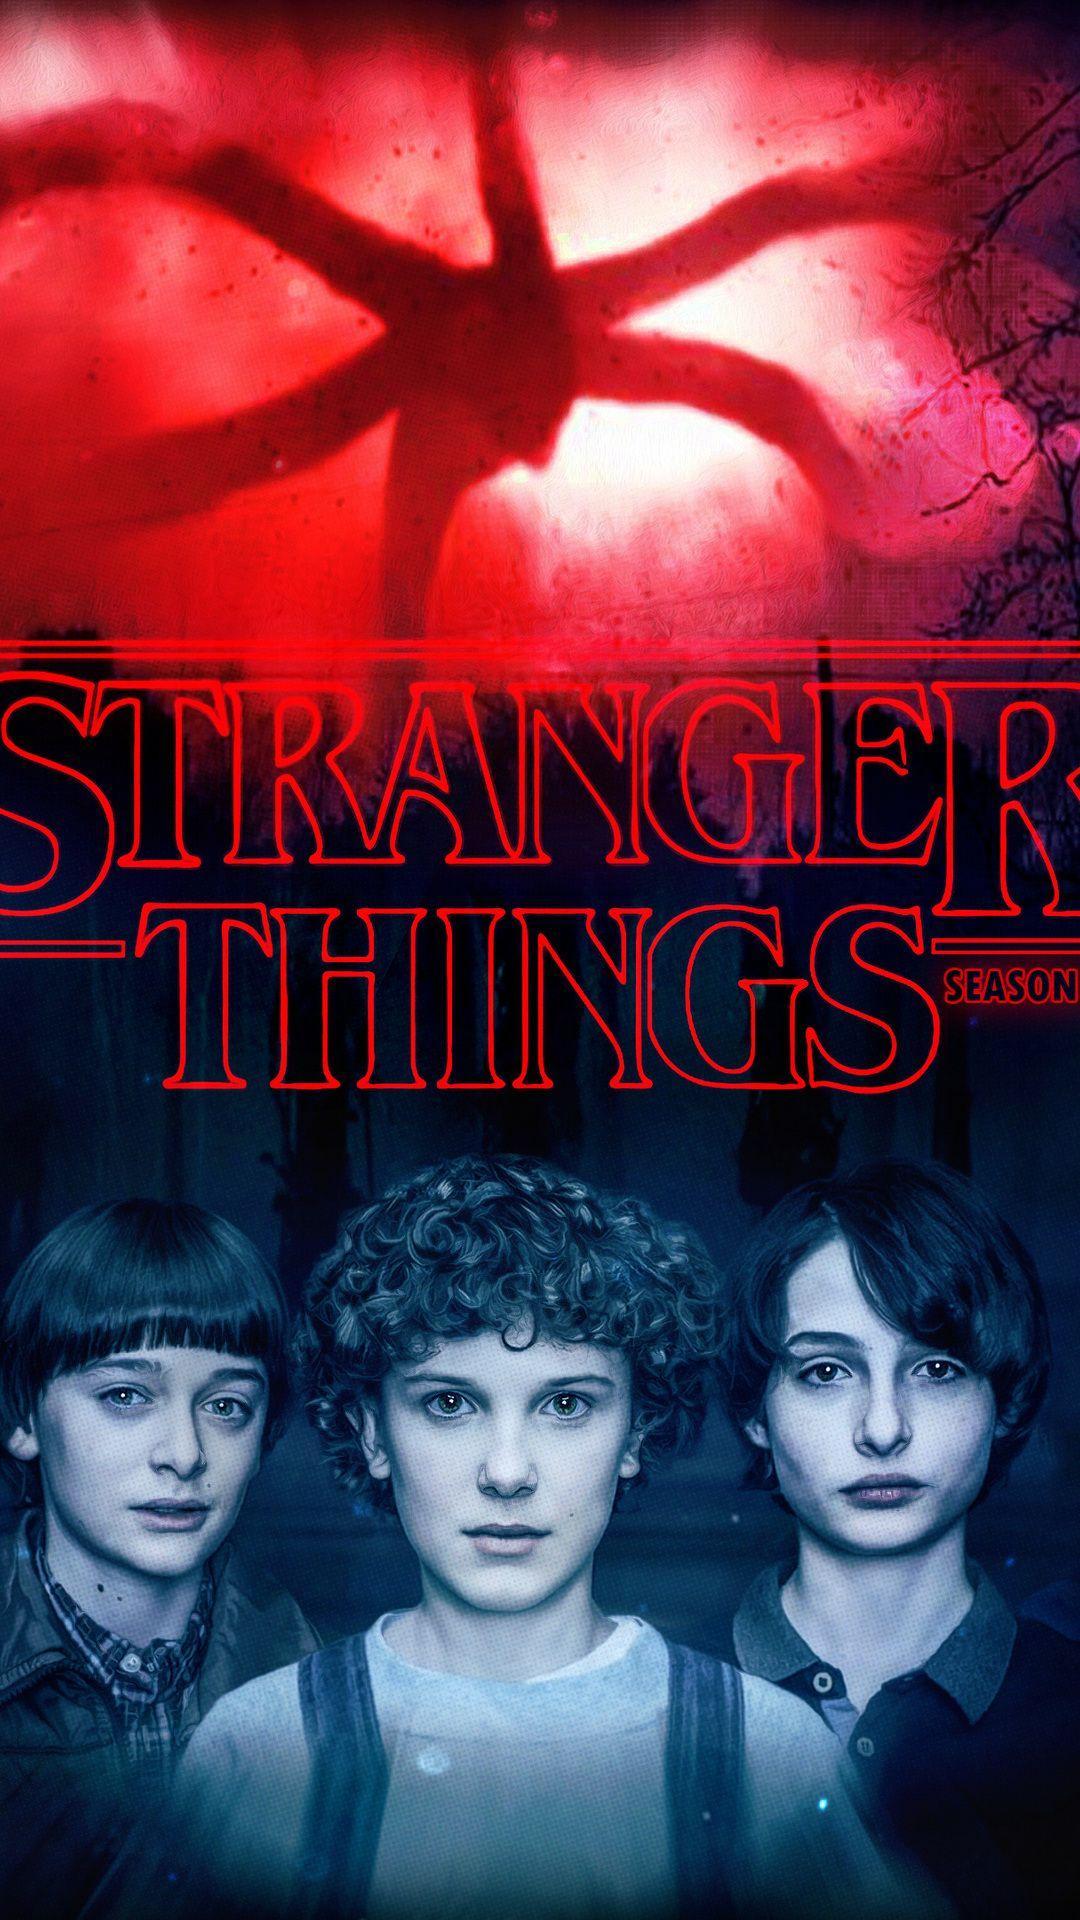 Stranger Things Season 3 Wallpapers Wallpaper Cave